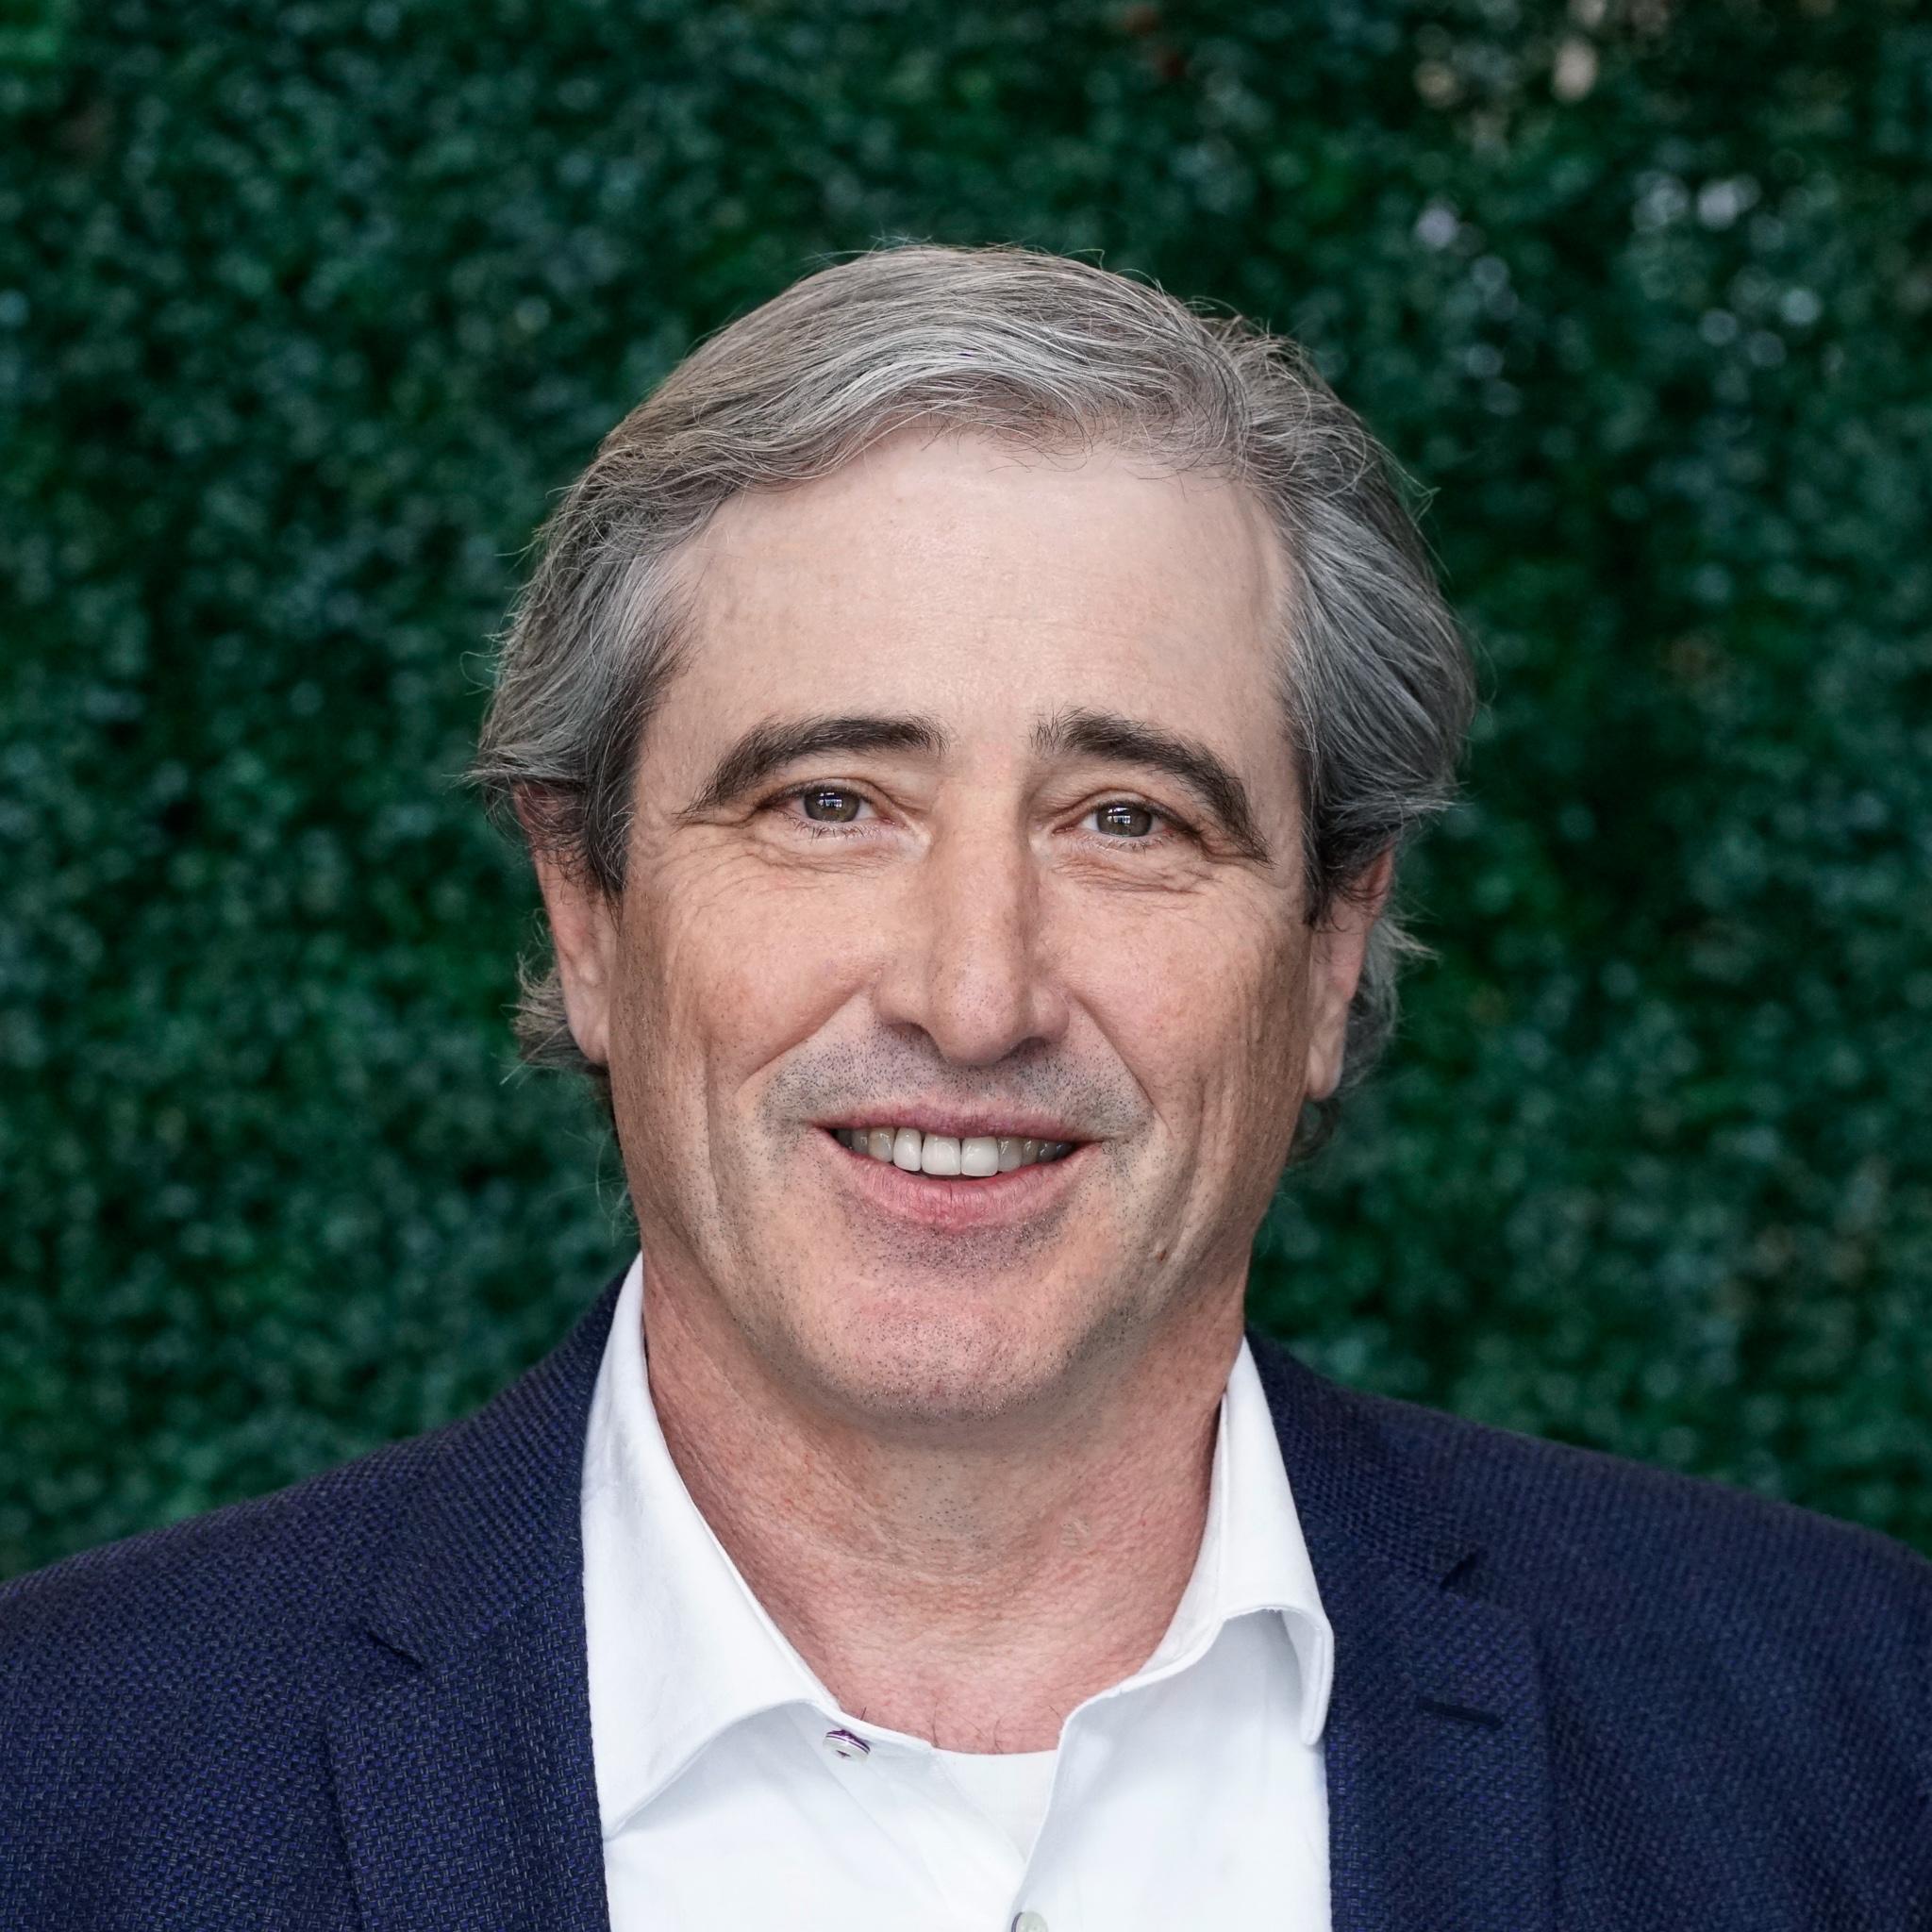 Paul O'Donoghue